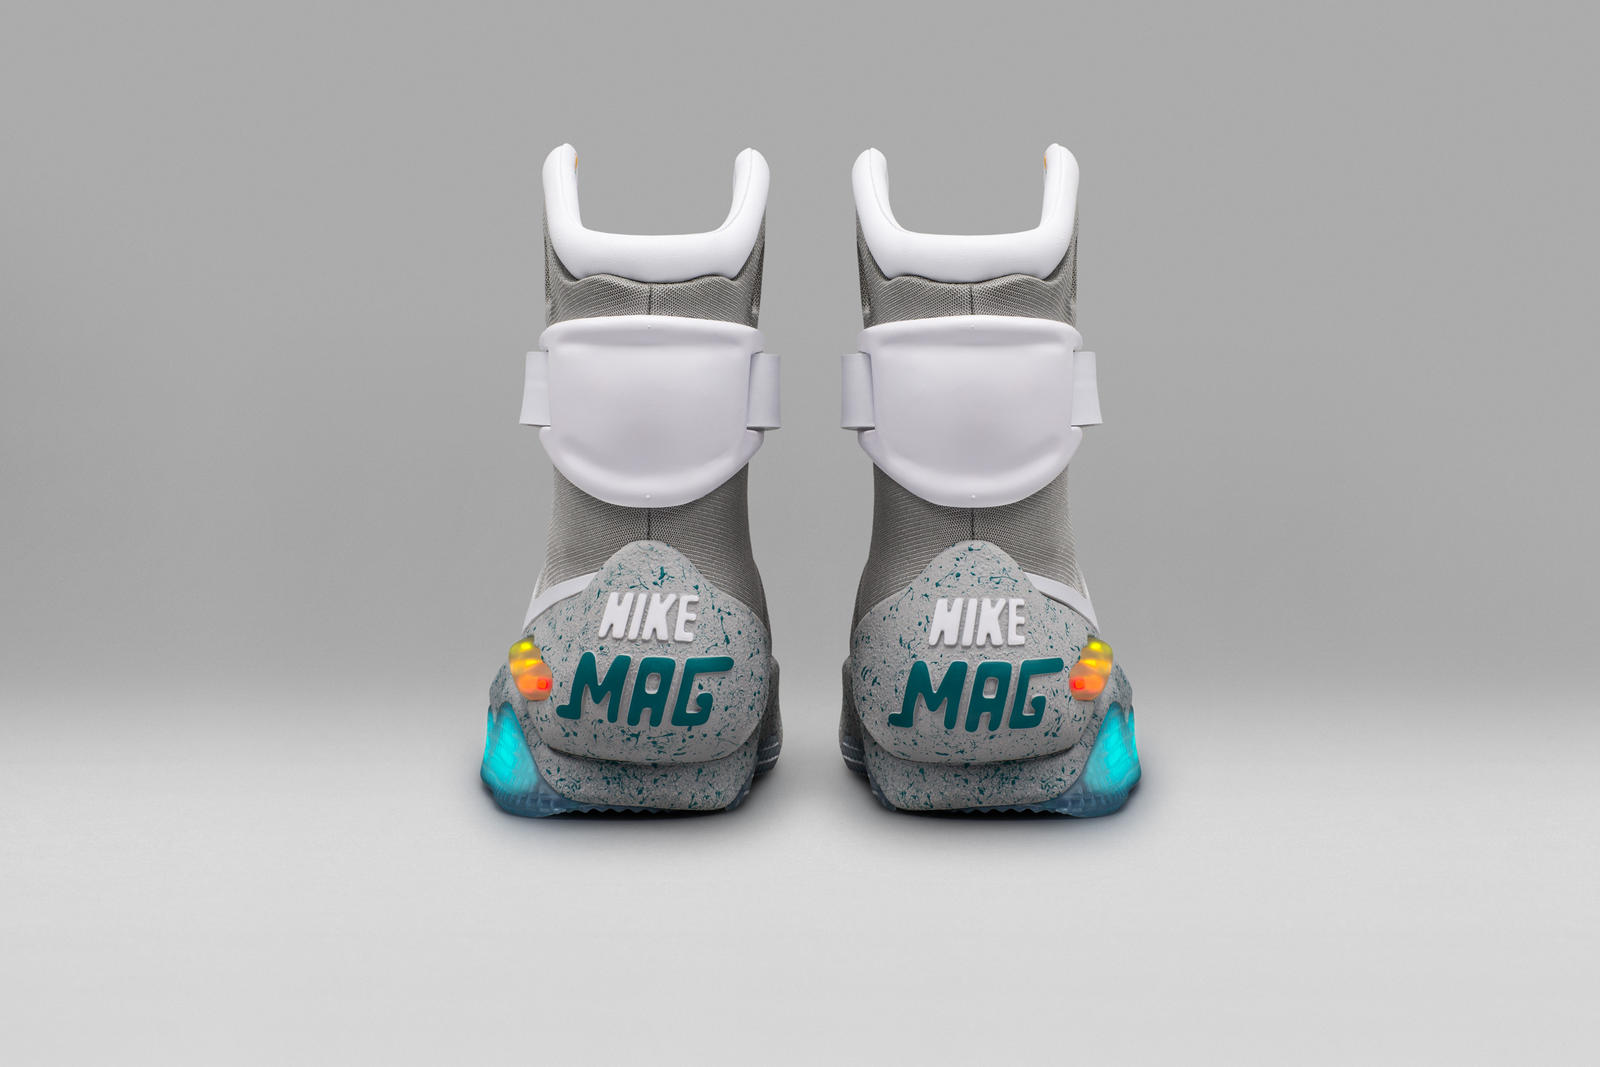 Xt07t7 2 Retour Le Sneakers Vers Autolacante Mag Nike De Futur 0nwkP8O